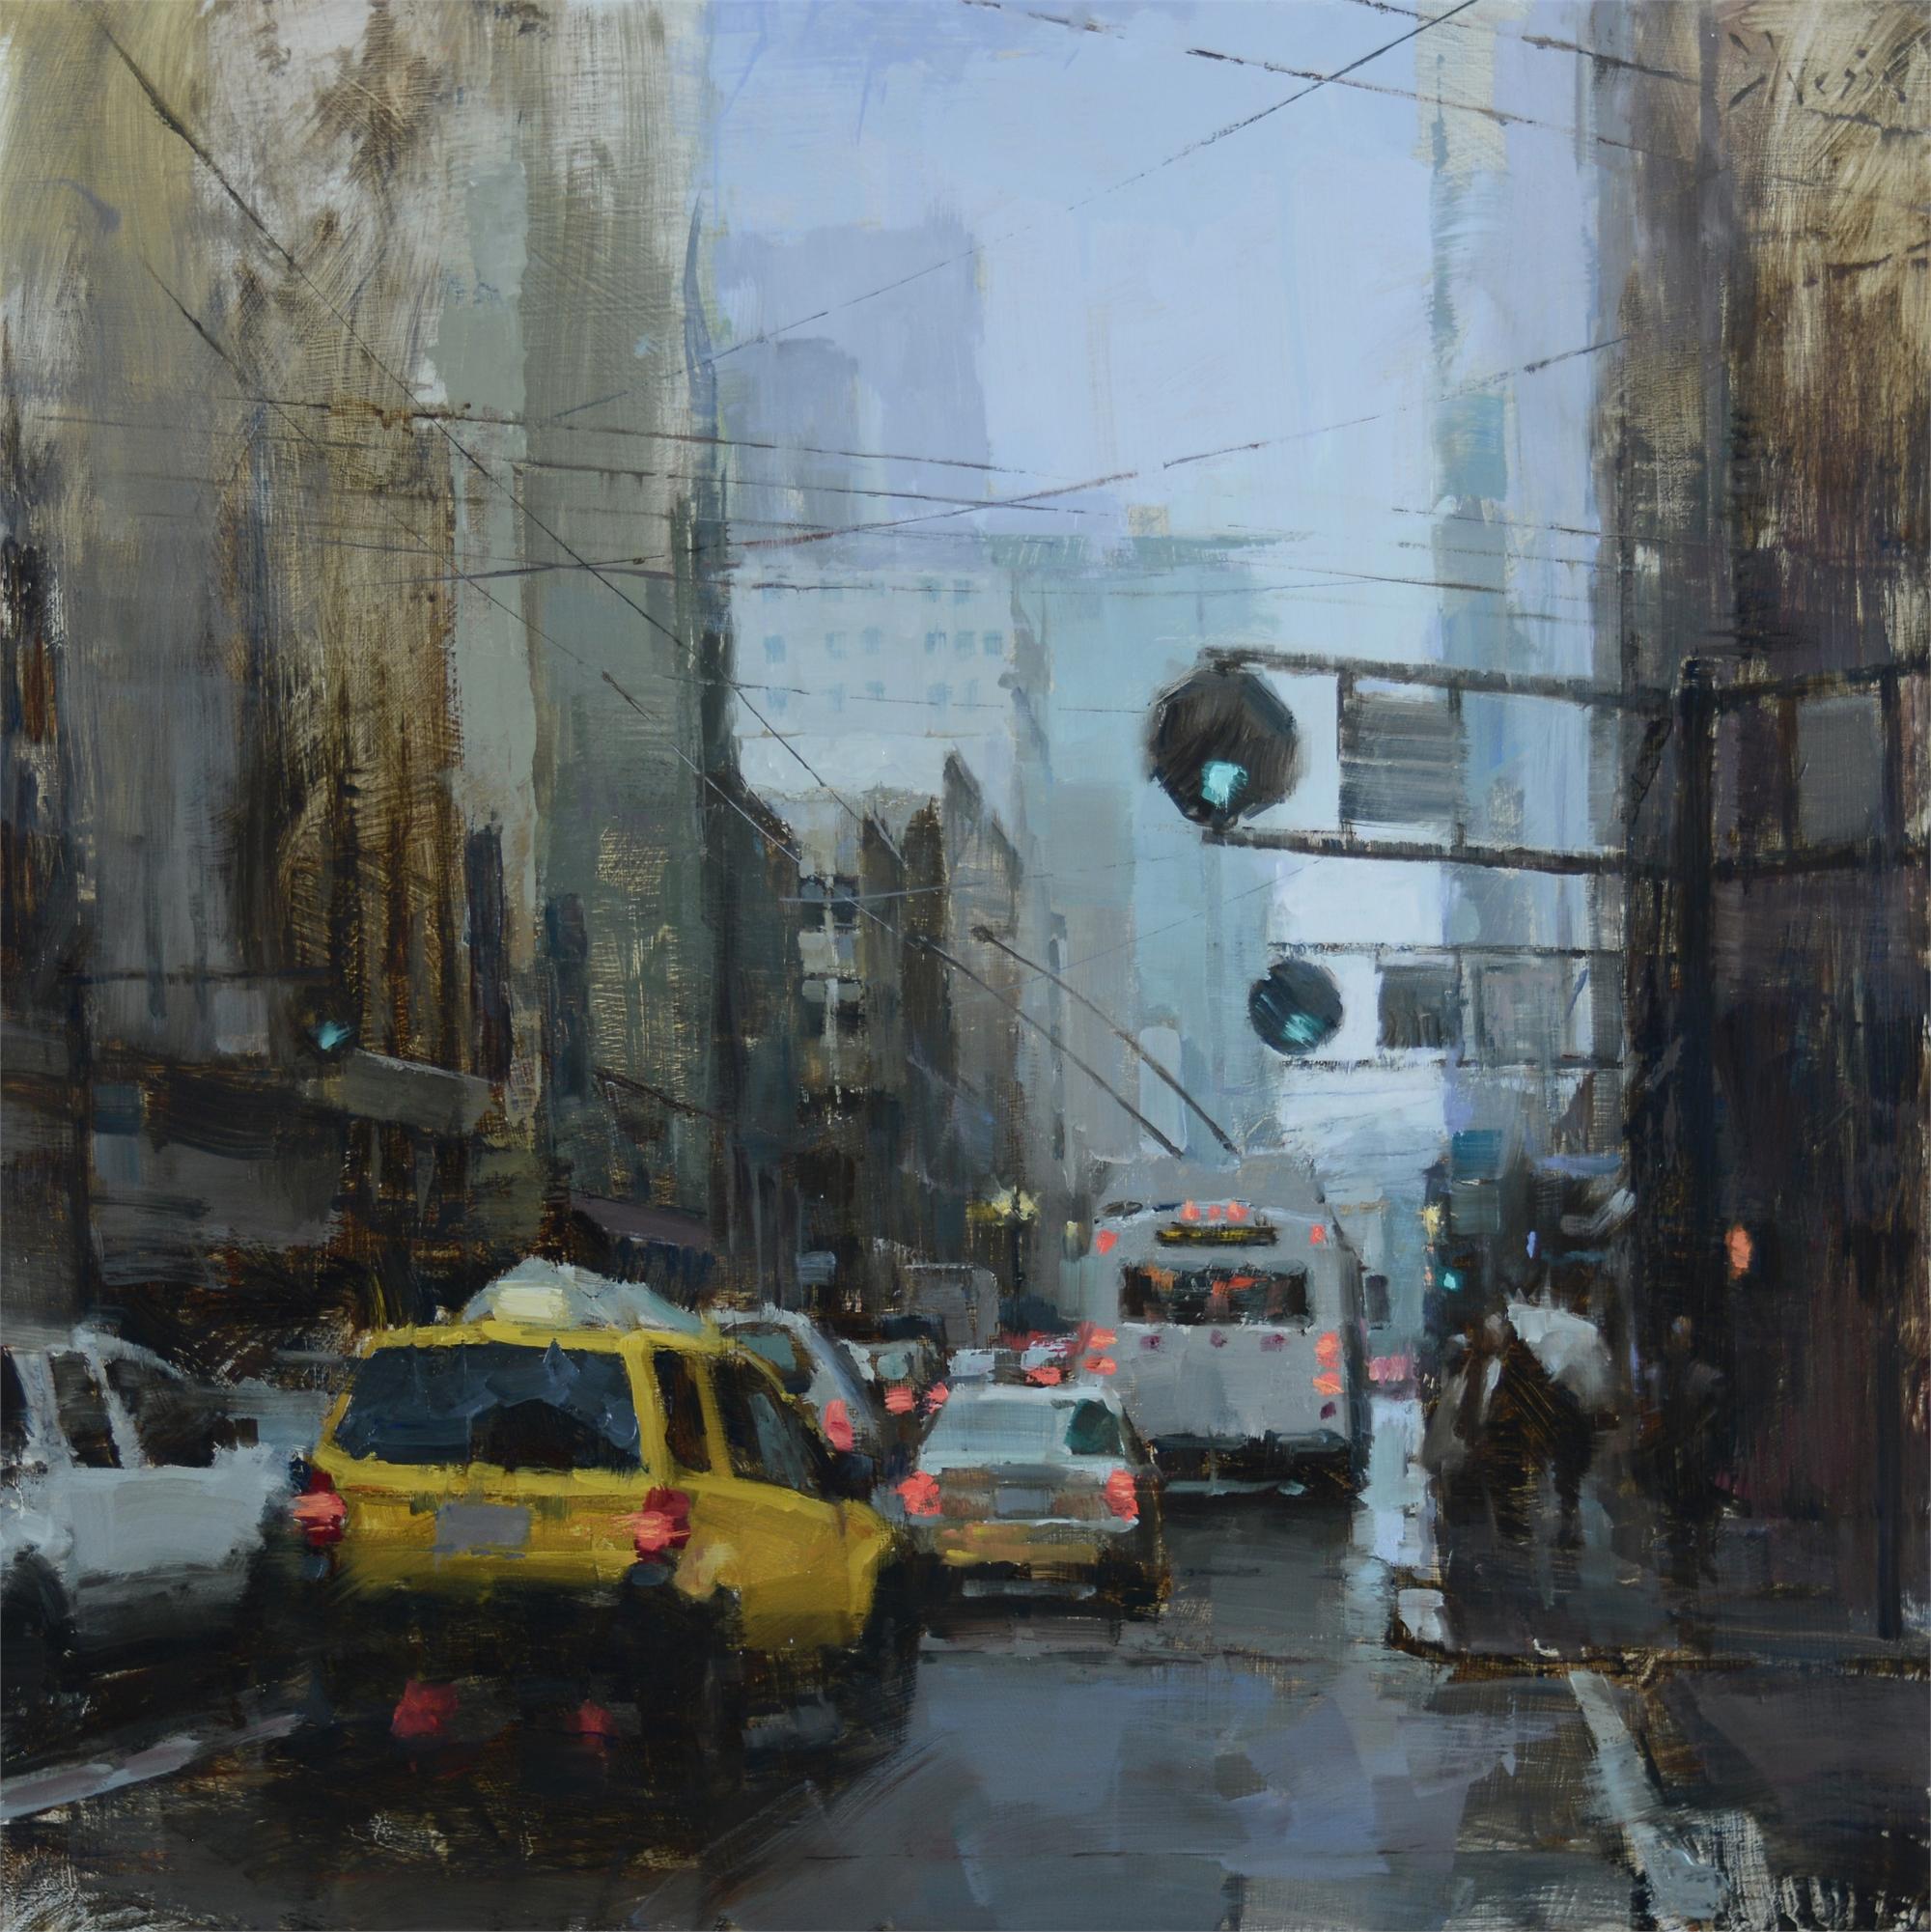 Kearny Street Traffic by Jacob Dhein